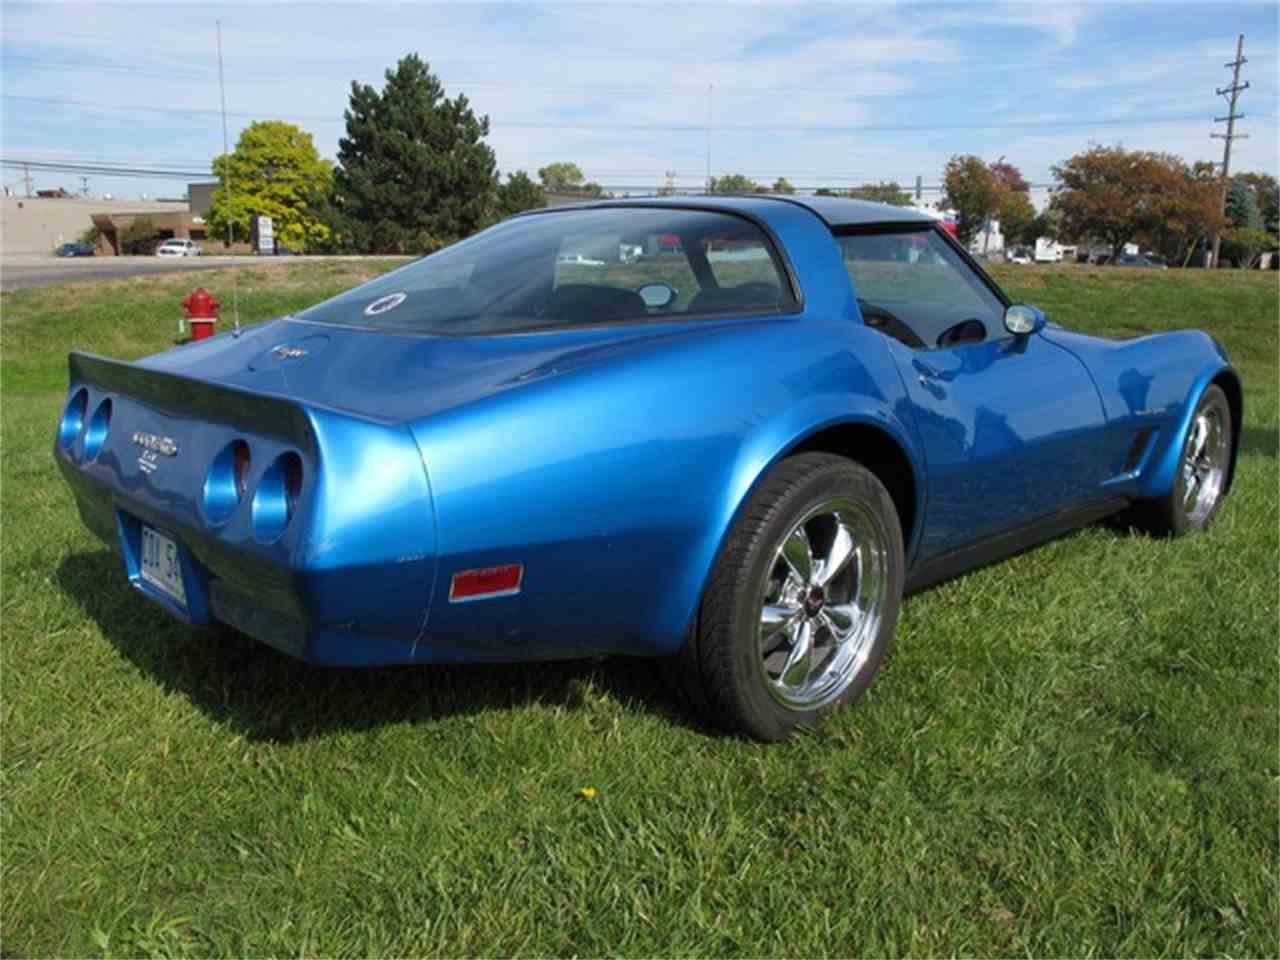 Large Picture of '82 Chevrolet Corvette located in Troy Michigan - $8,250.00 - JPQD